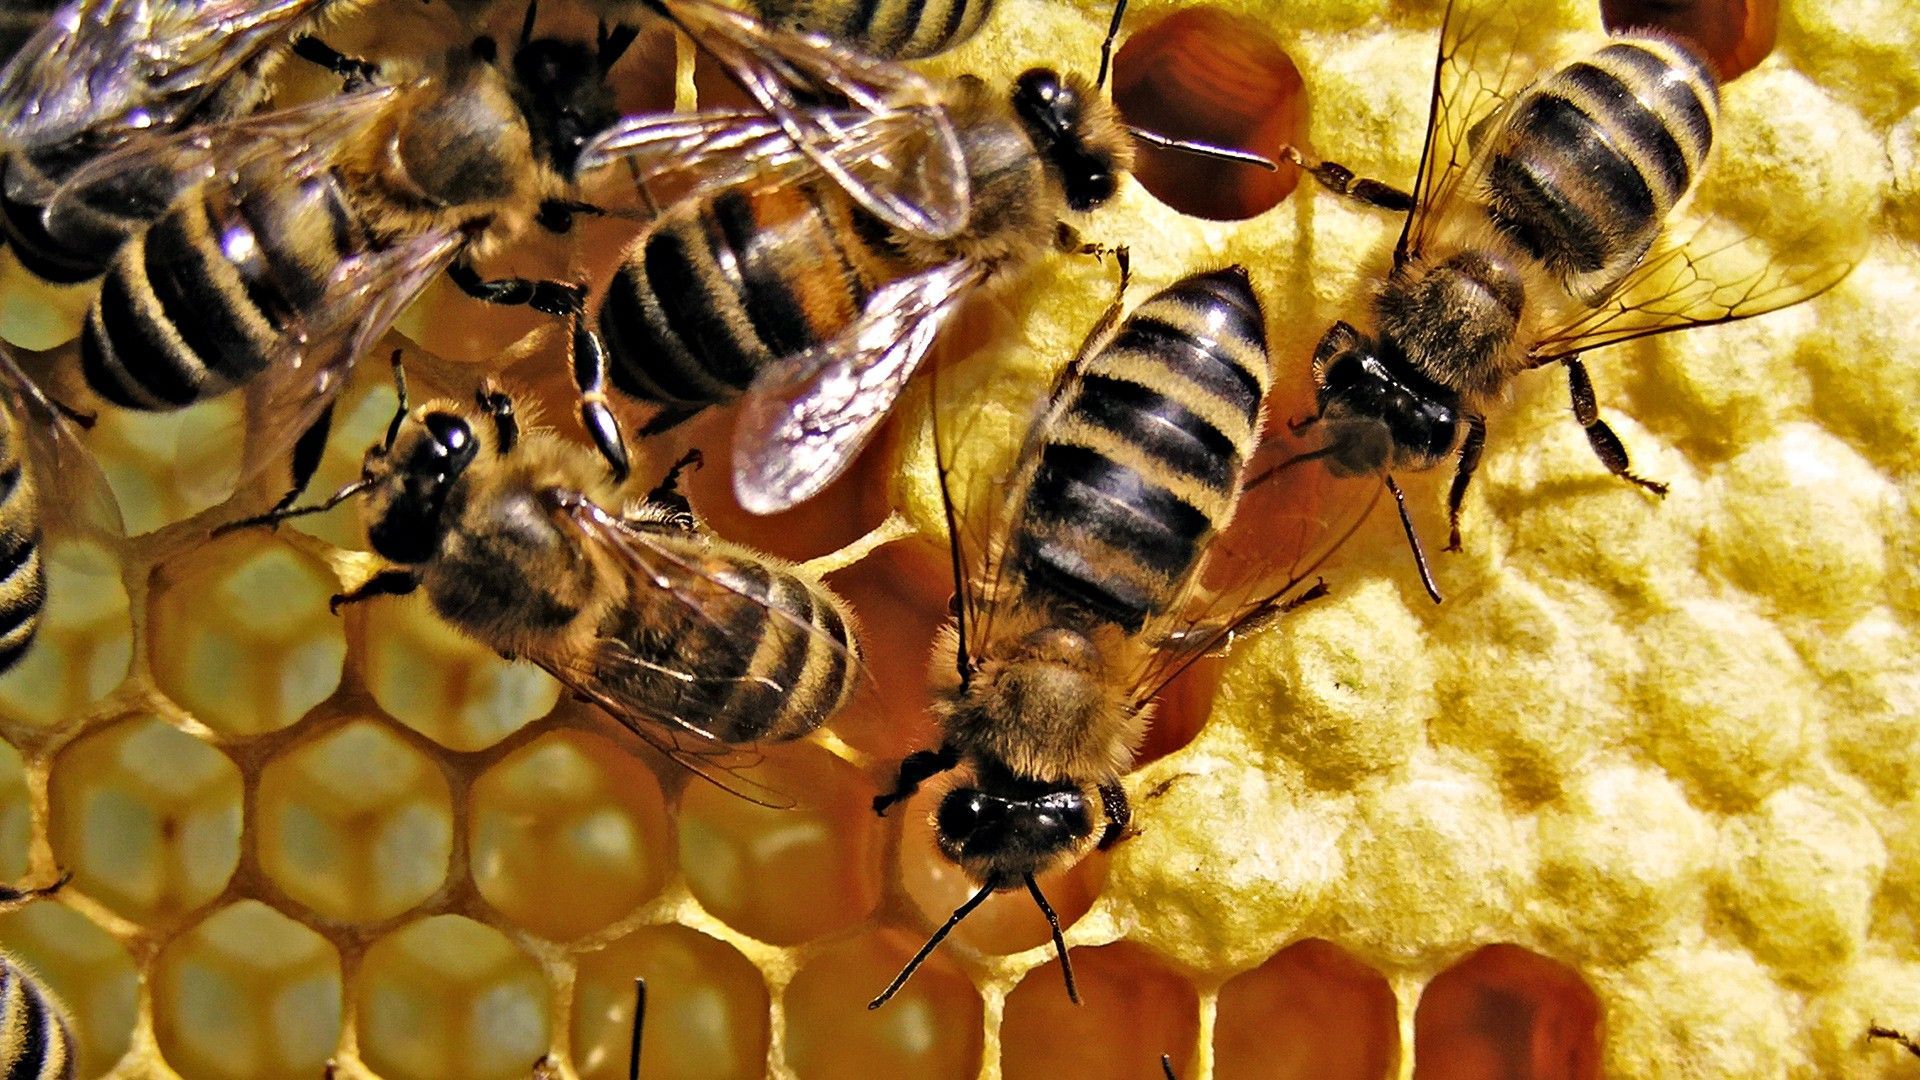 bees pics hd